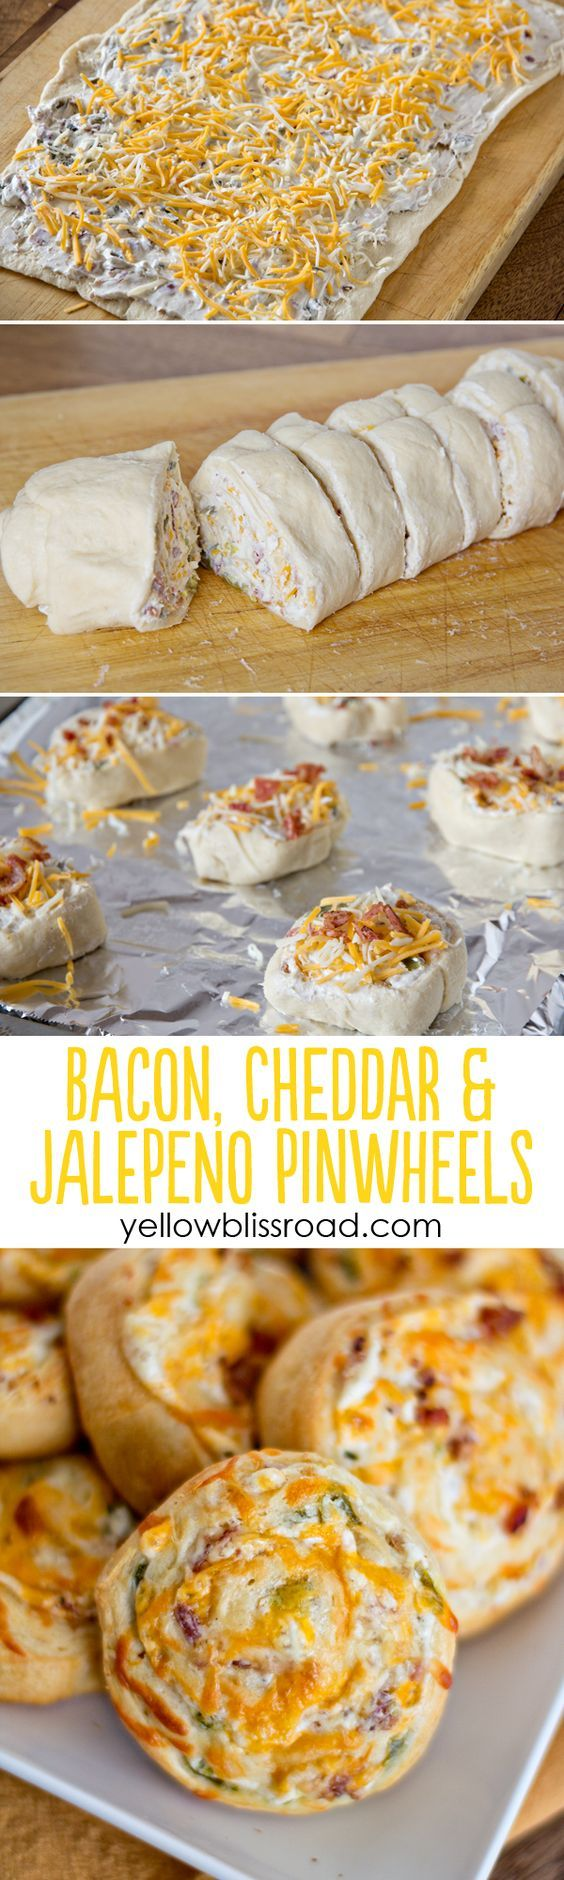 Bacon, Cheddar & Jalapeño Pinwheels.. makes me think of bacon wrapped jalpenos